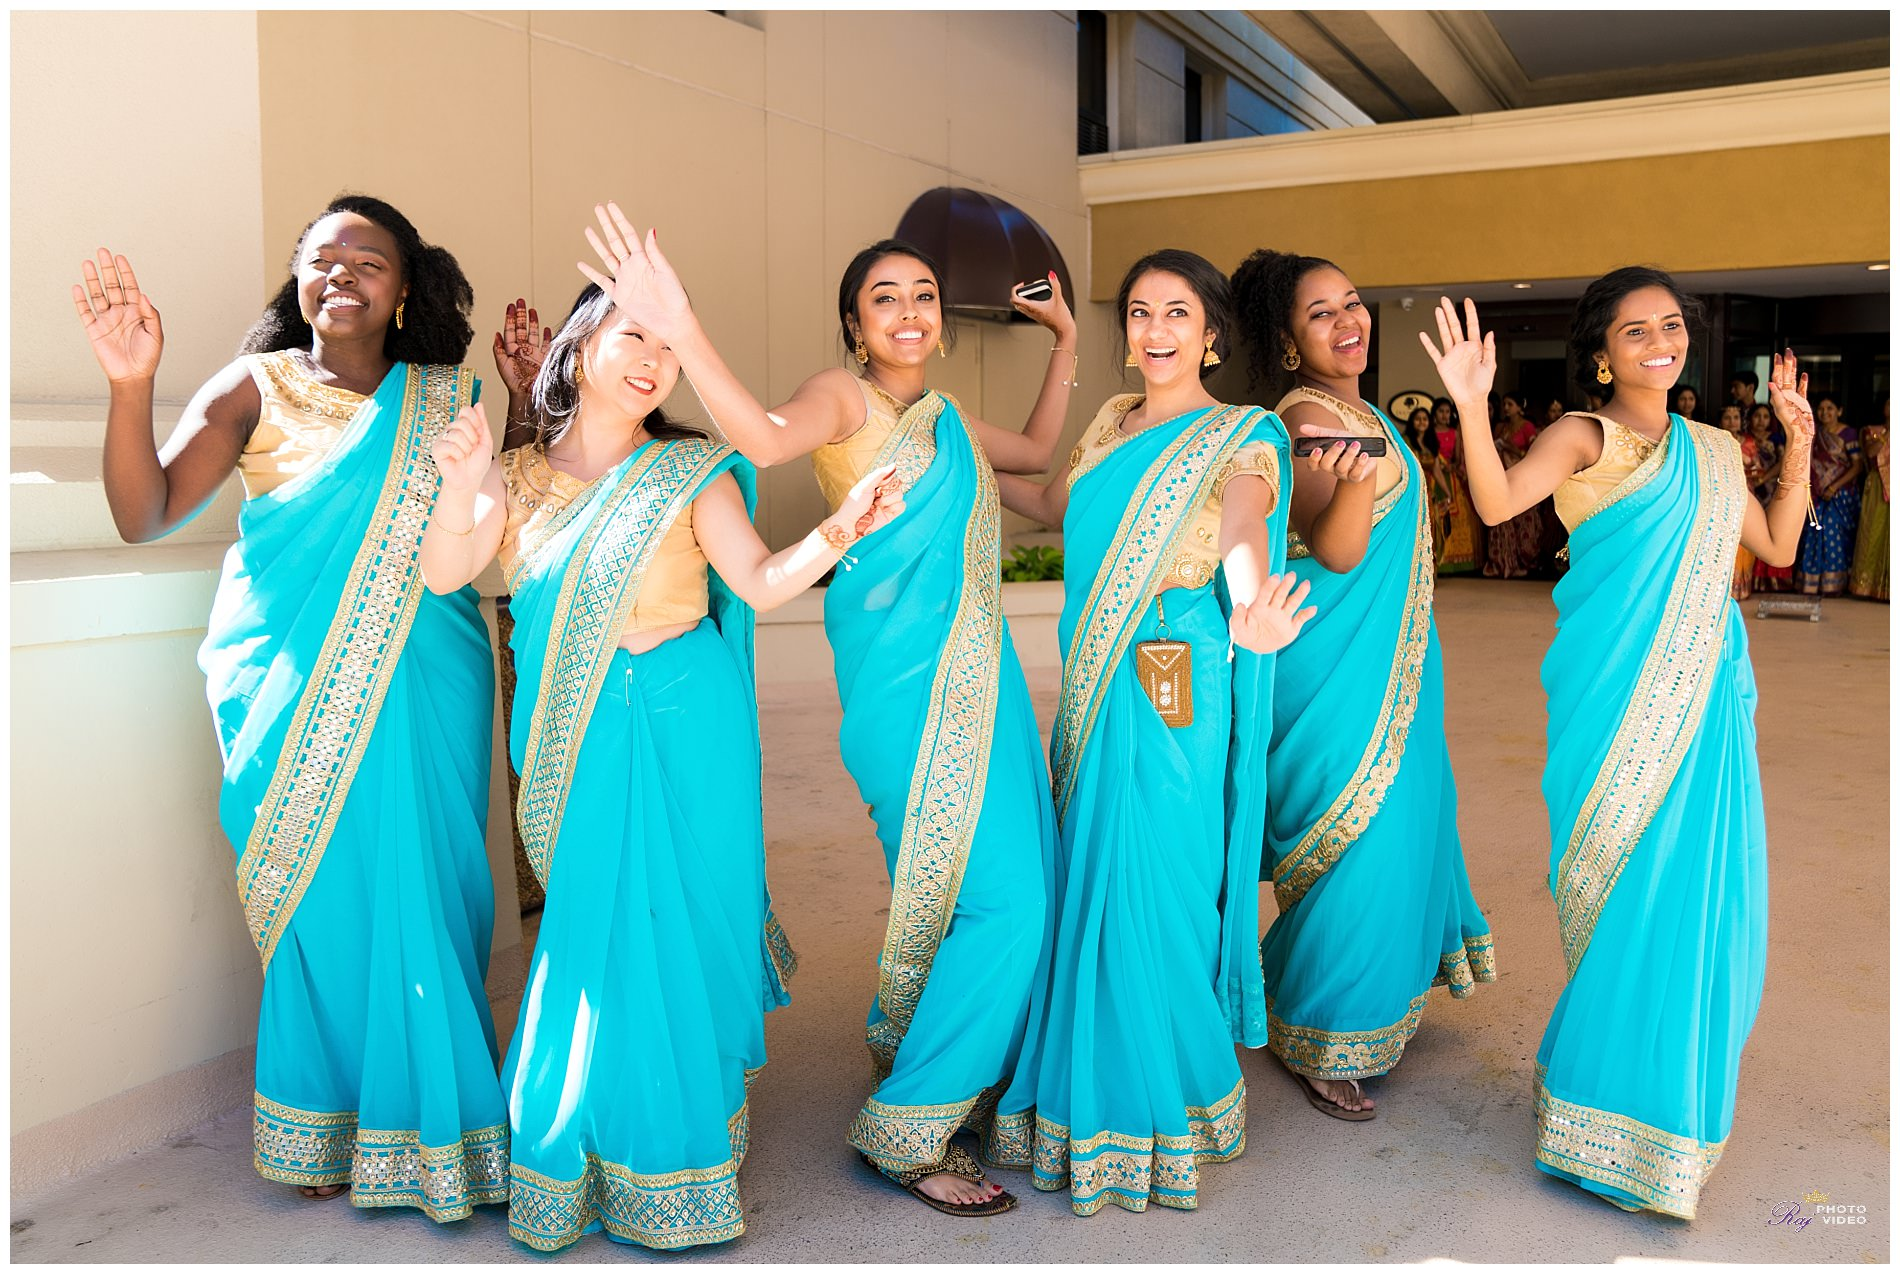 doubletree-by-hilton-hotel-wilmington-de-wedding-krishna-ritesh-47.jpg